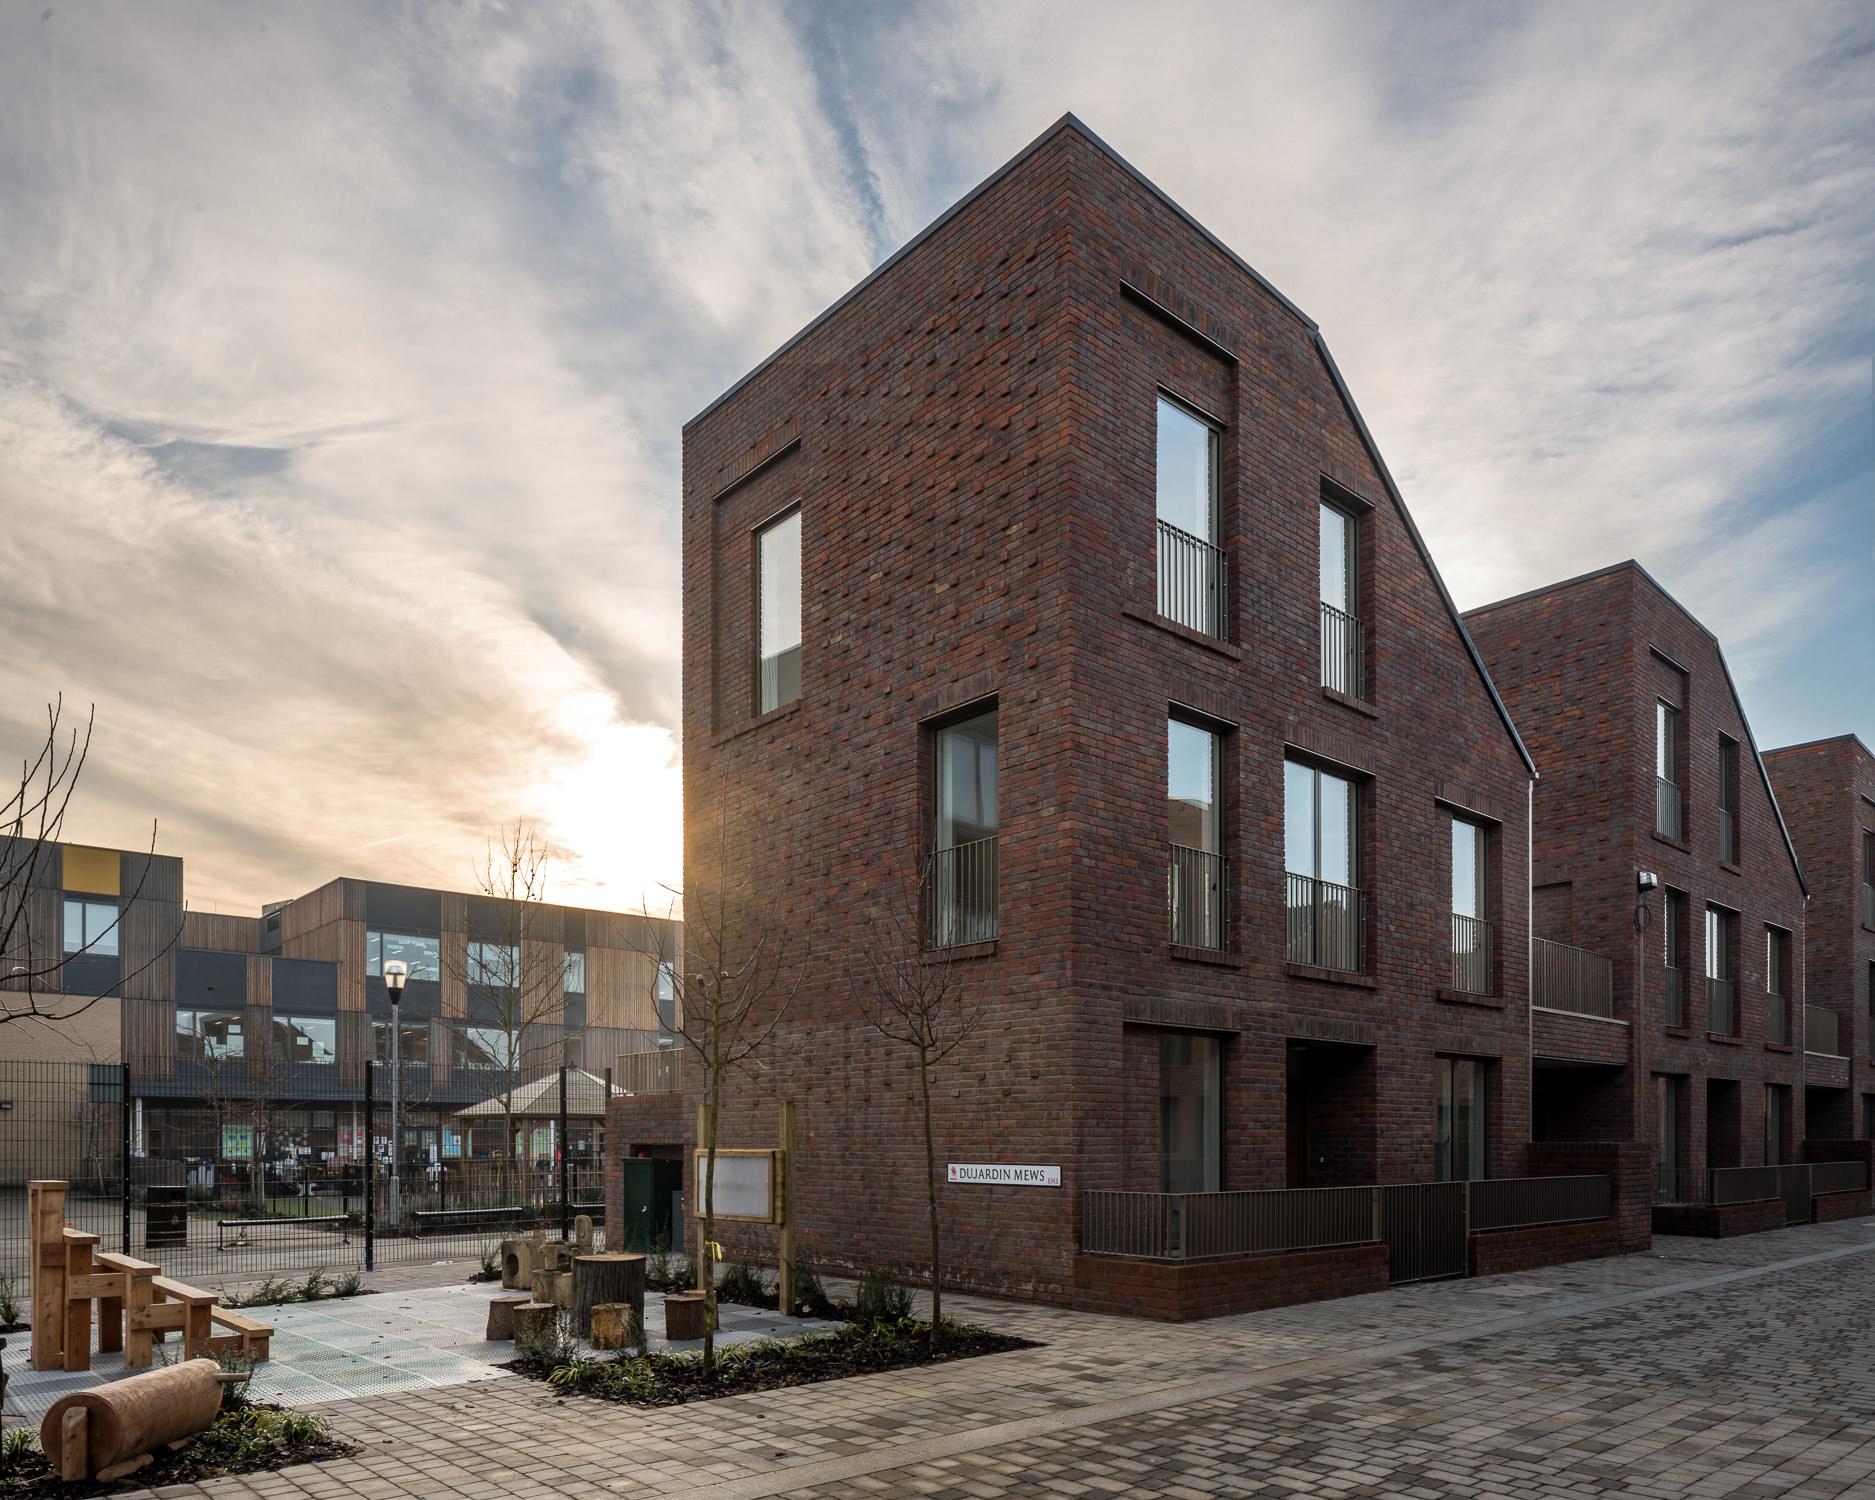 mark-hadden-architecture-photographer-architectuur-interieur-fotografie-london-amsterdam-_DSC0993.jpg